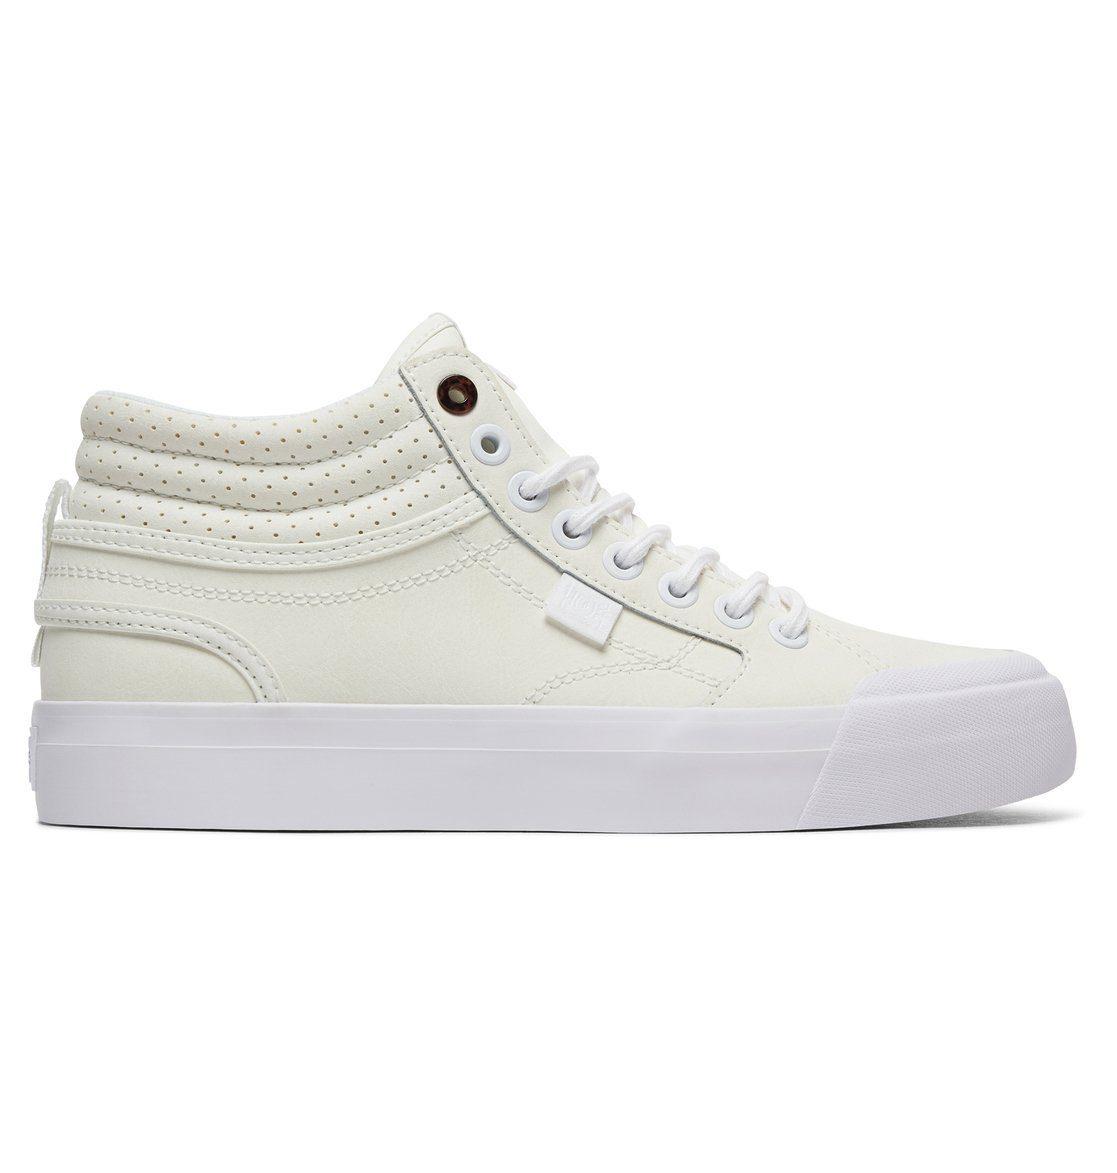 DC Shoes Hi Tops Evan HI SE online kaufen  White